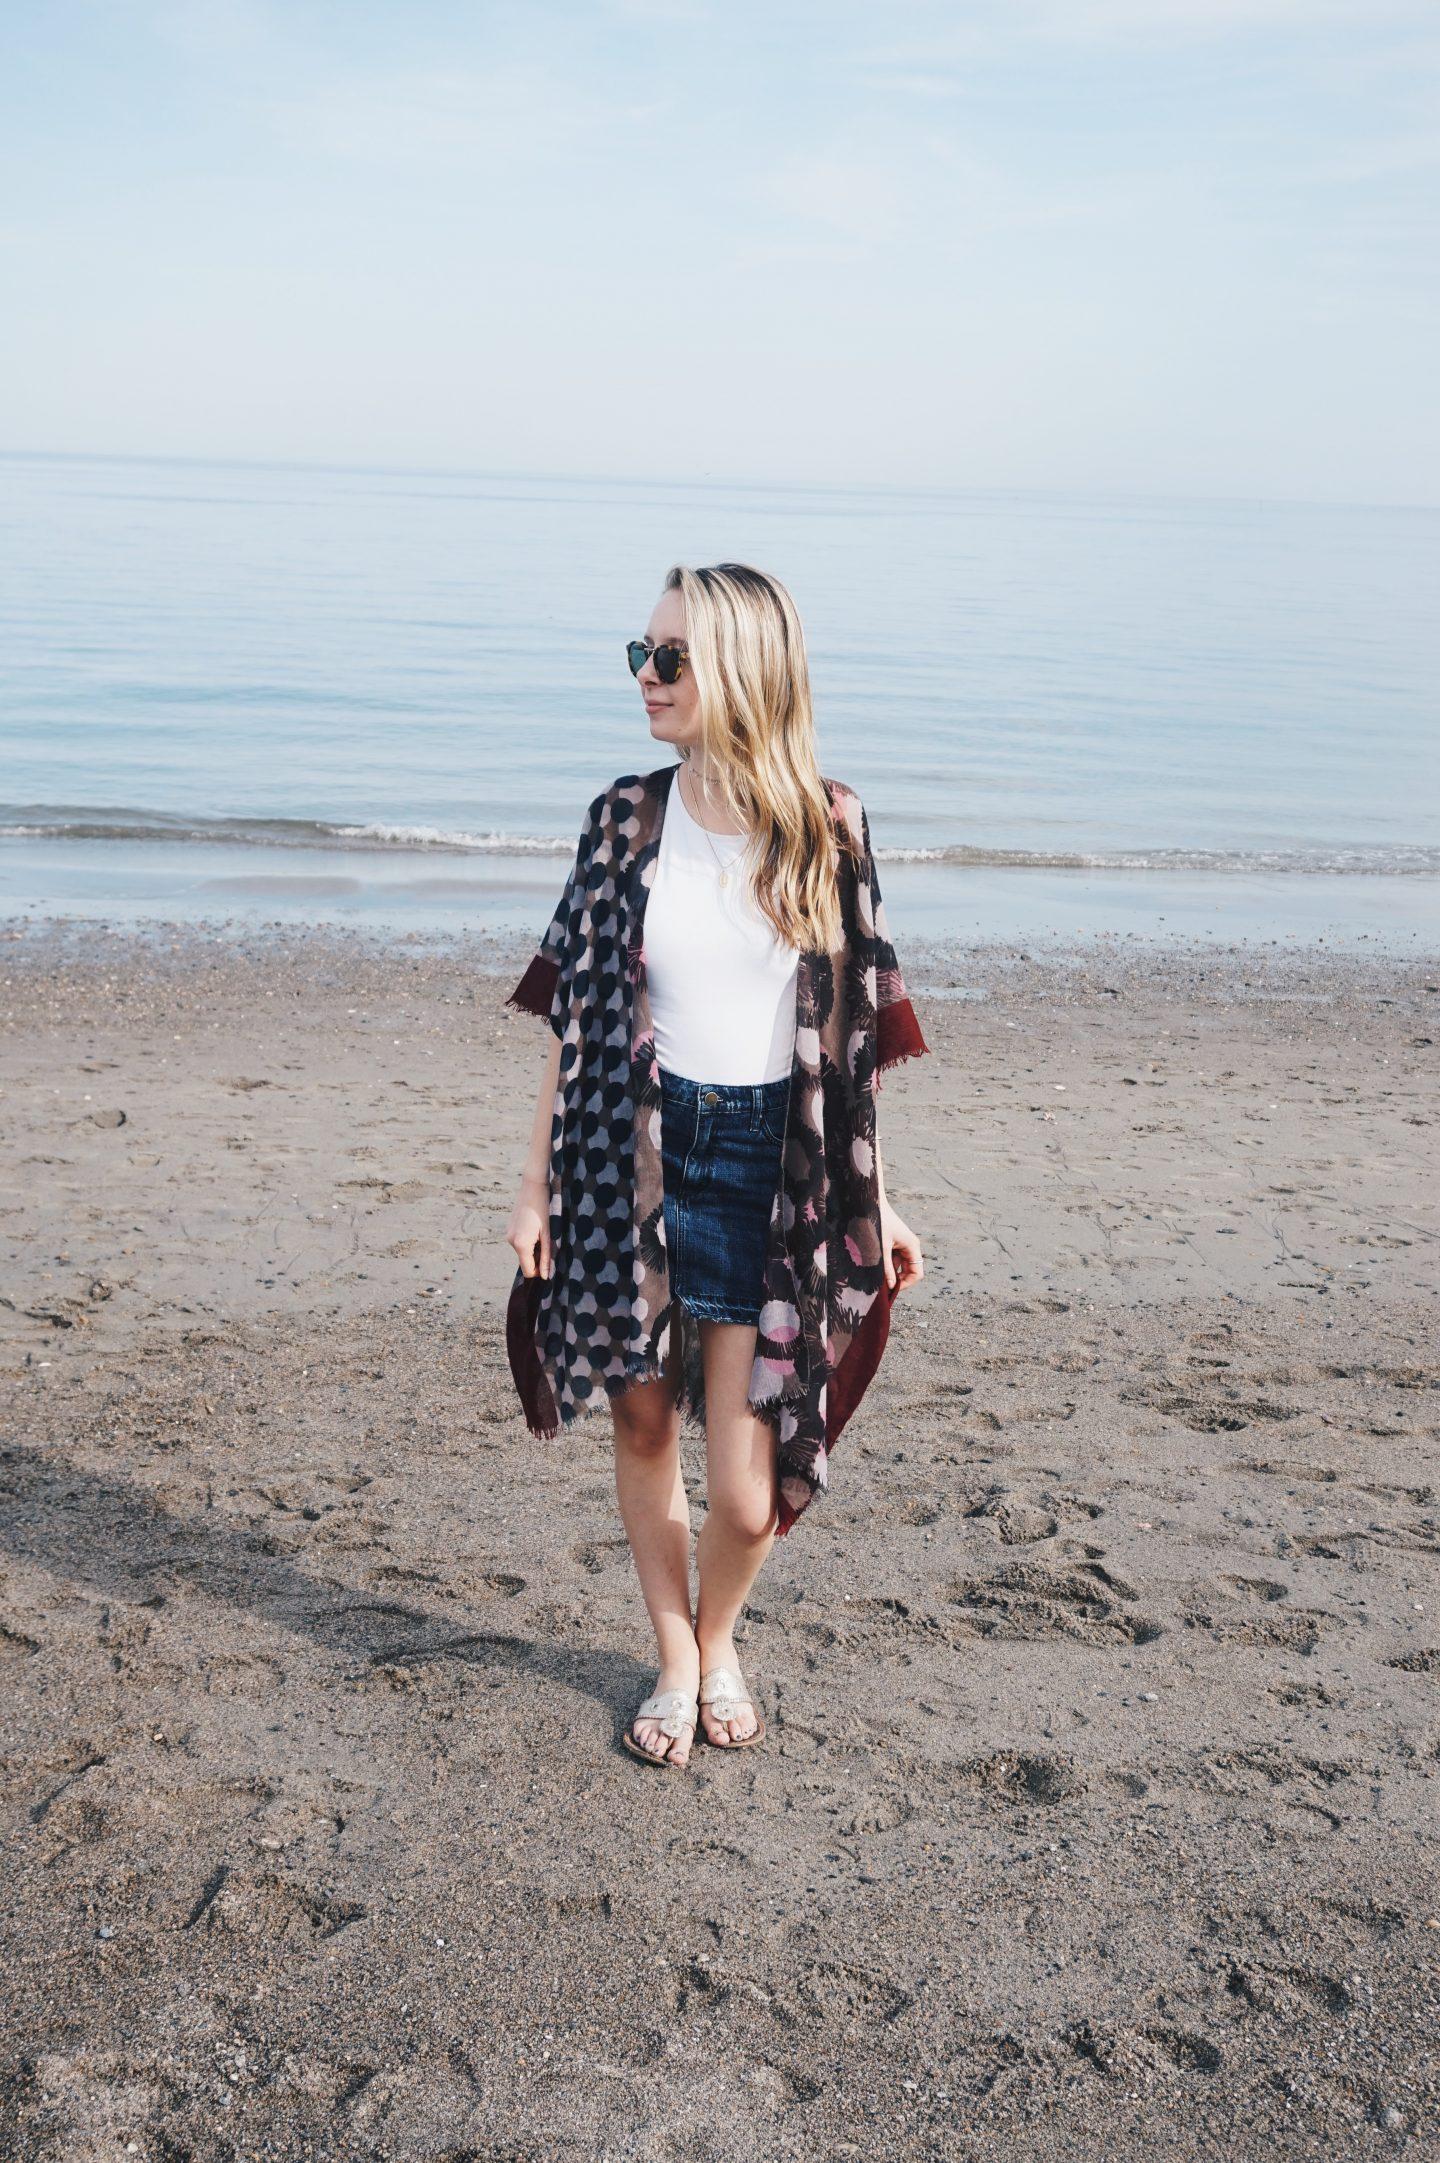 Spring Beach Kimonos